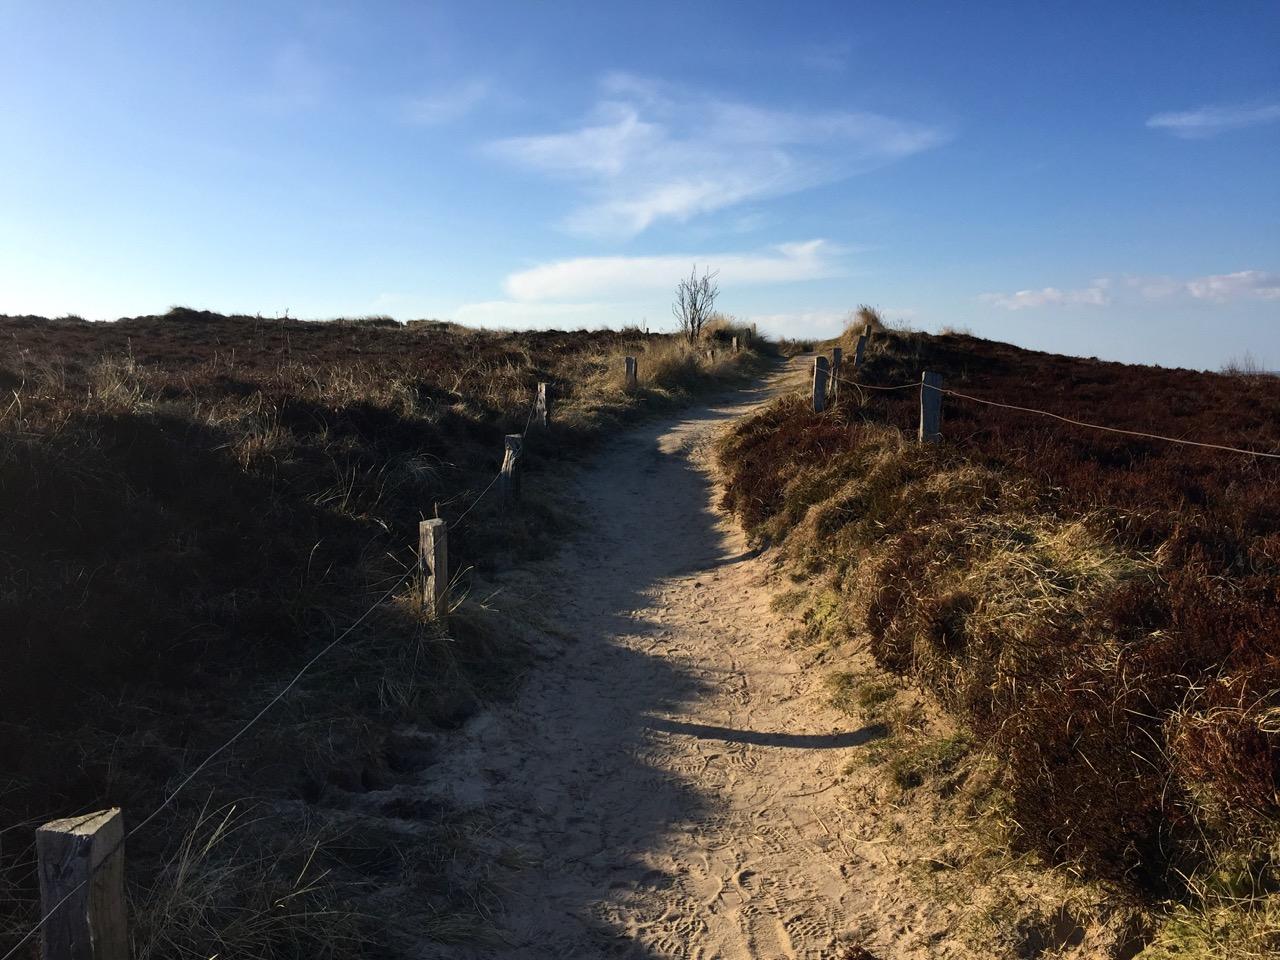 Sylt Aktivurlaub Wandern auf Sylt